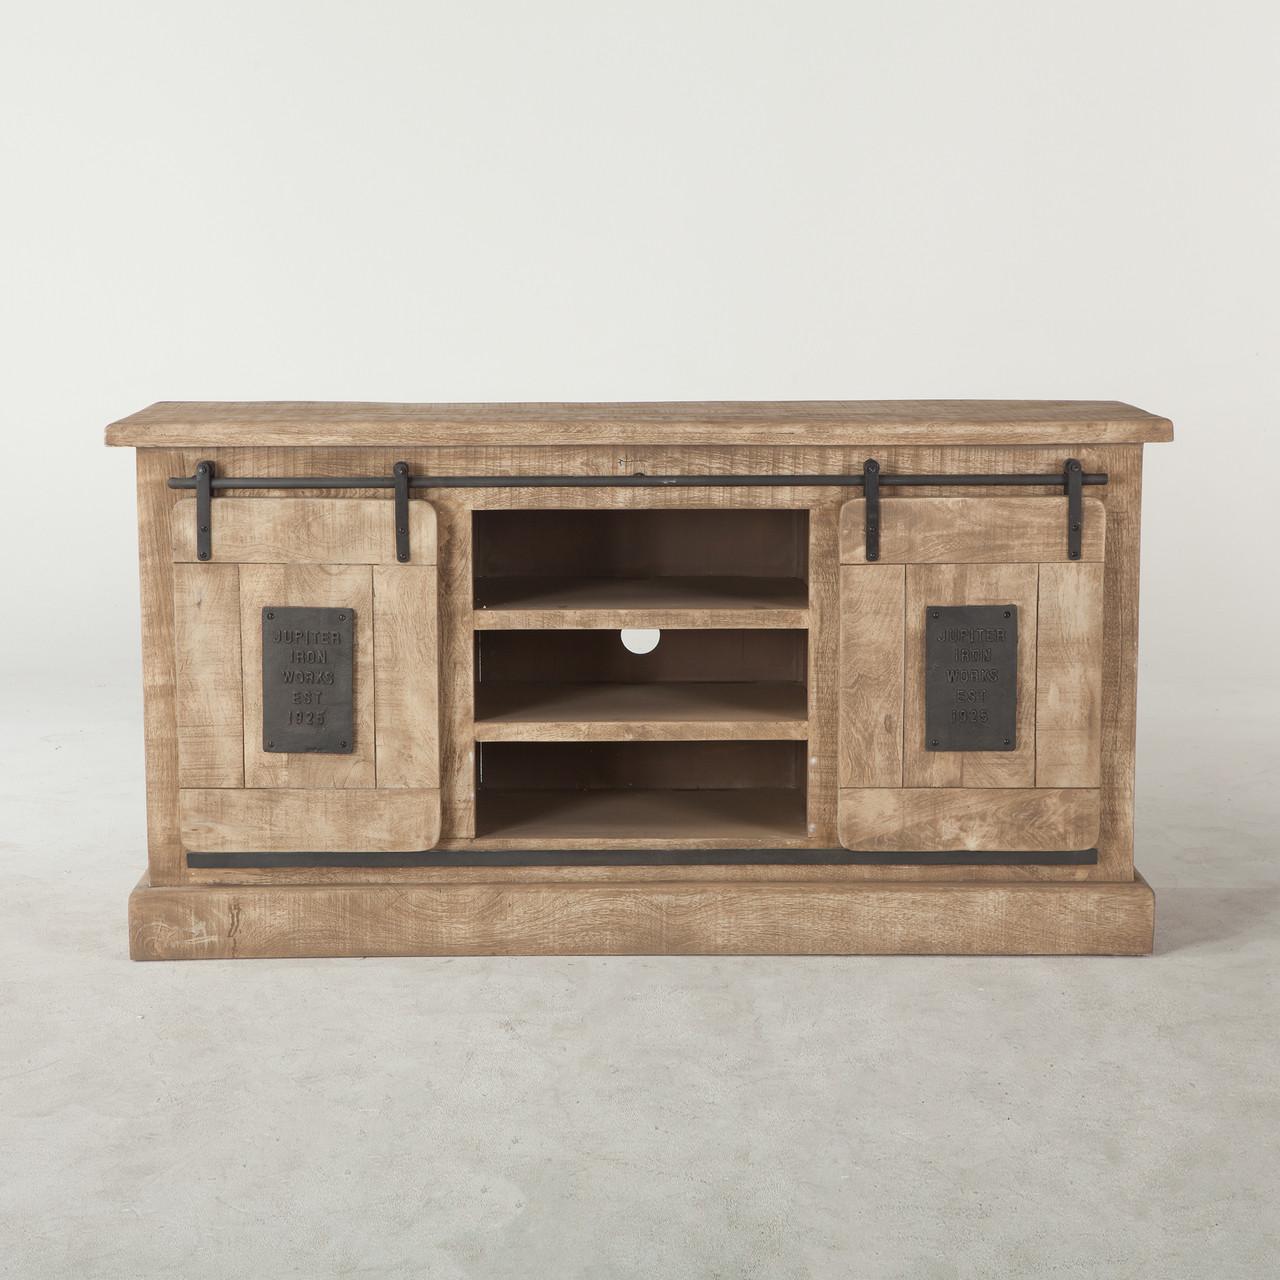 Http Truebiglifecom Industrial Media Furniture Slate Pro Design Roma Sideboard 2 Pintu 3 Laci Espresso Fst Pc64ao 25177146065707912801280 485251492206832c2